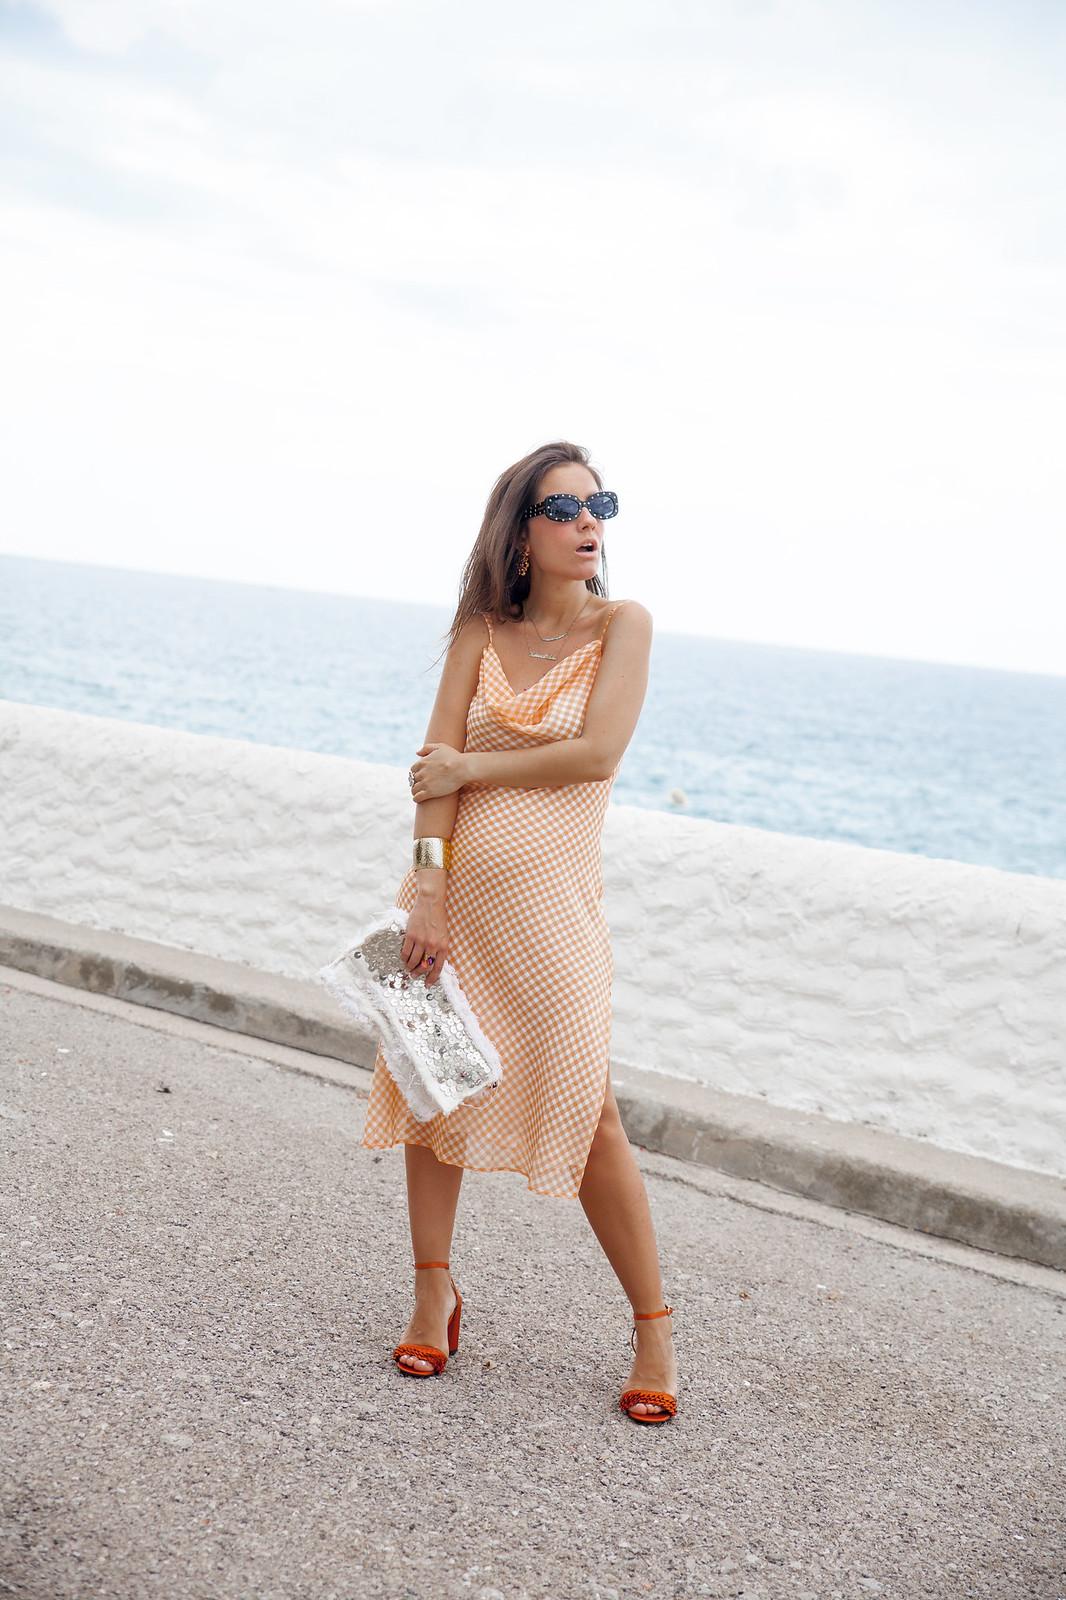 05_LPA_dress_revolve_ambassador_spain_influencer_theguestgirl_supremenyc_hypebae_laura_santolaria